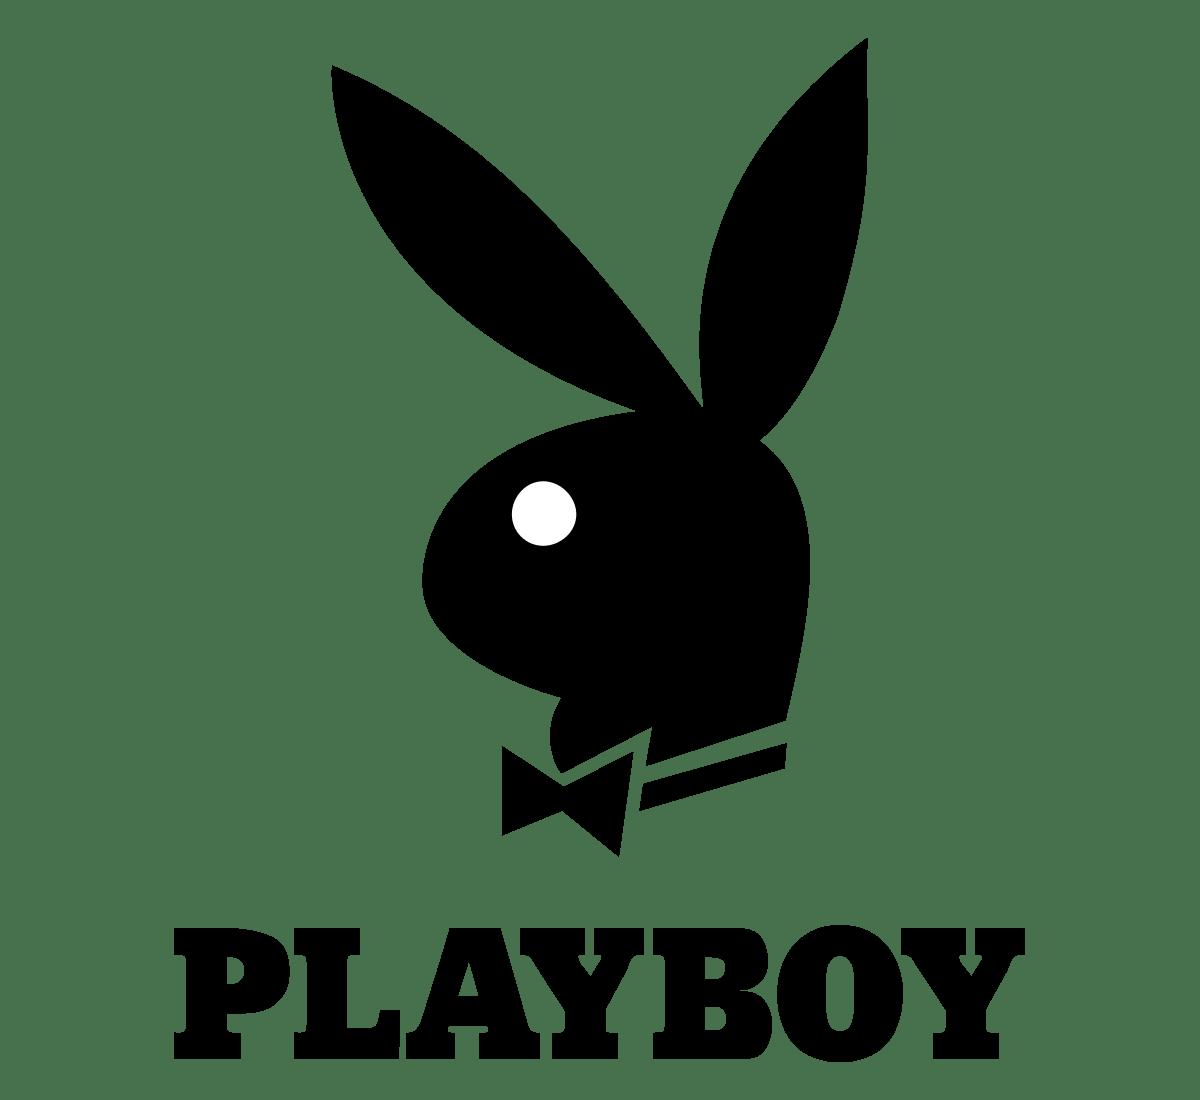 https://i0.wp.com/1000logos.net/wp-content/uploads/2017/05/Playboy-Logo.png